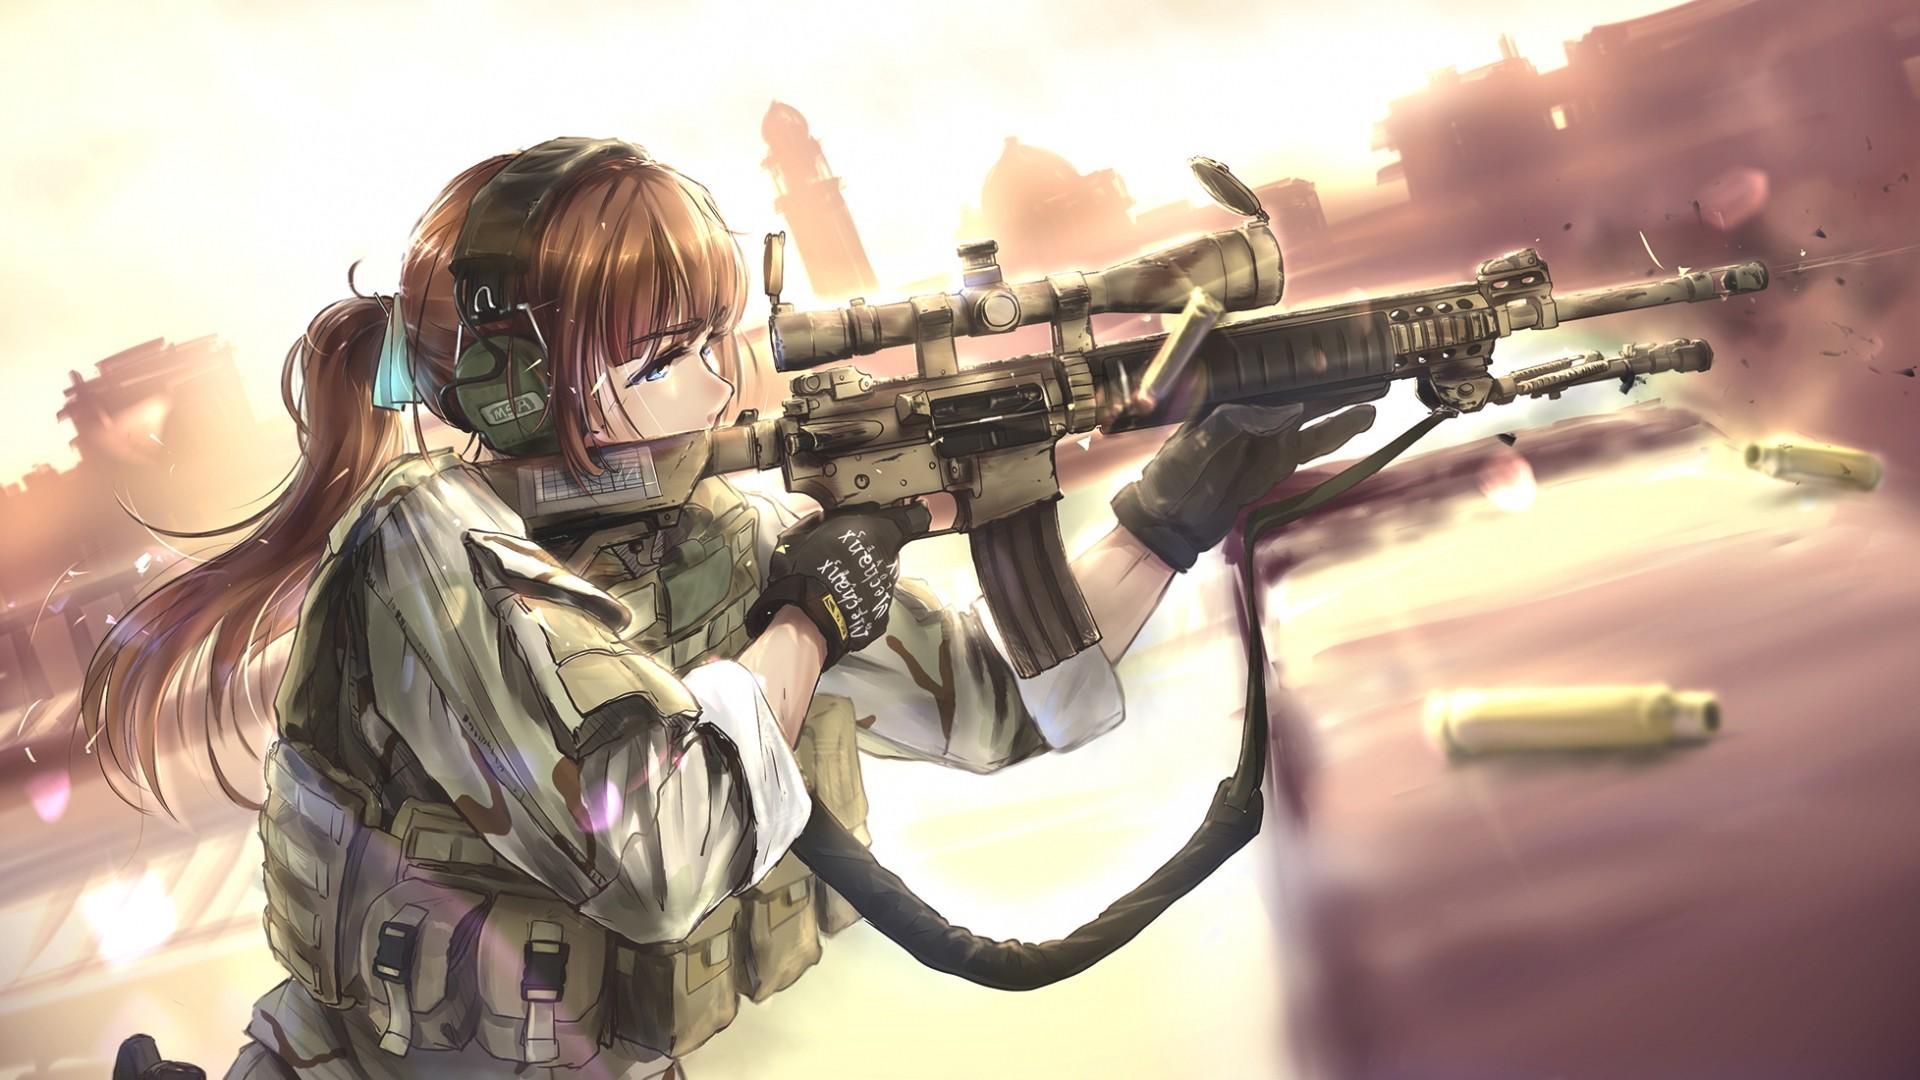 Sniper Anime Girl Wallpapers - Wallpaper Cave